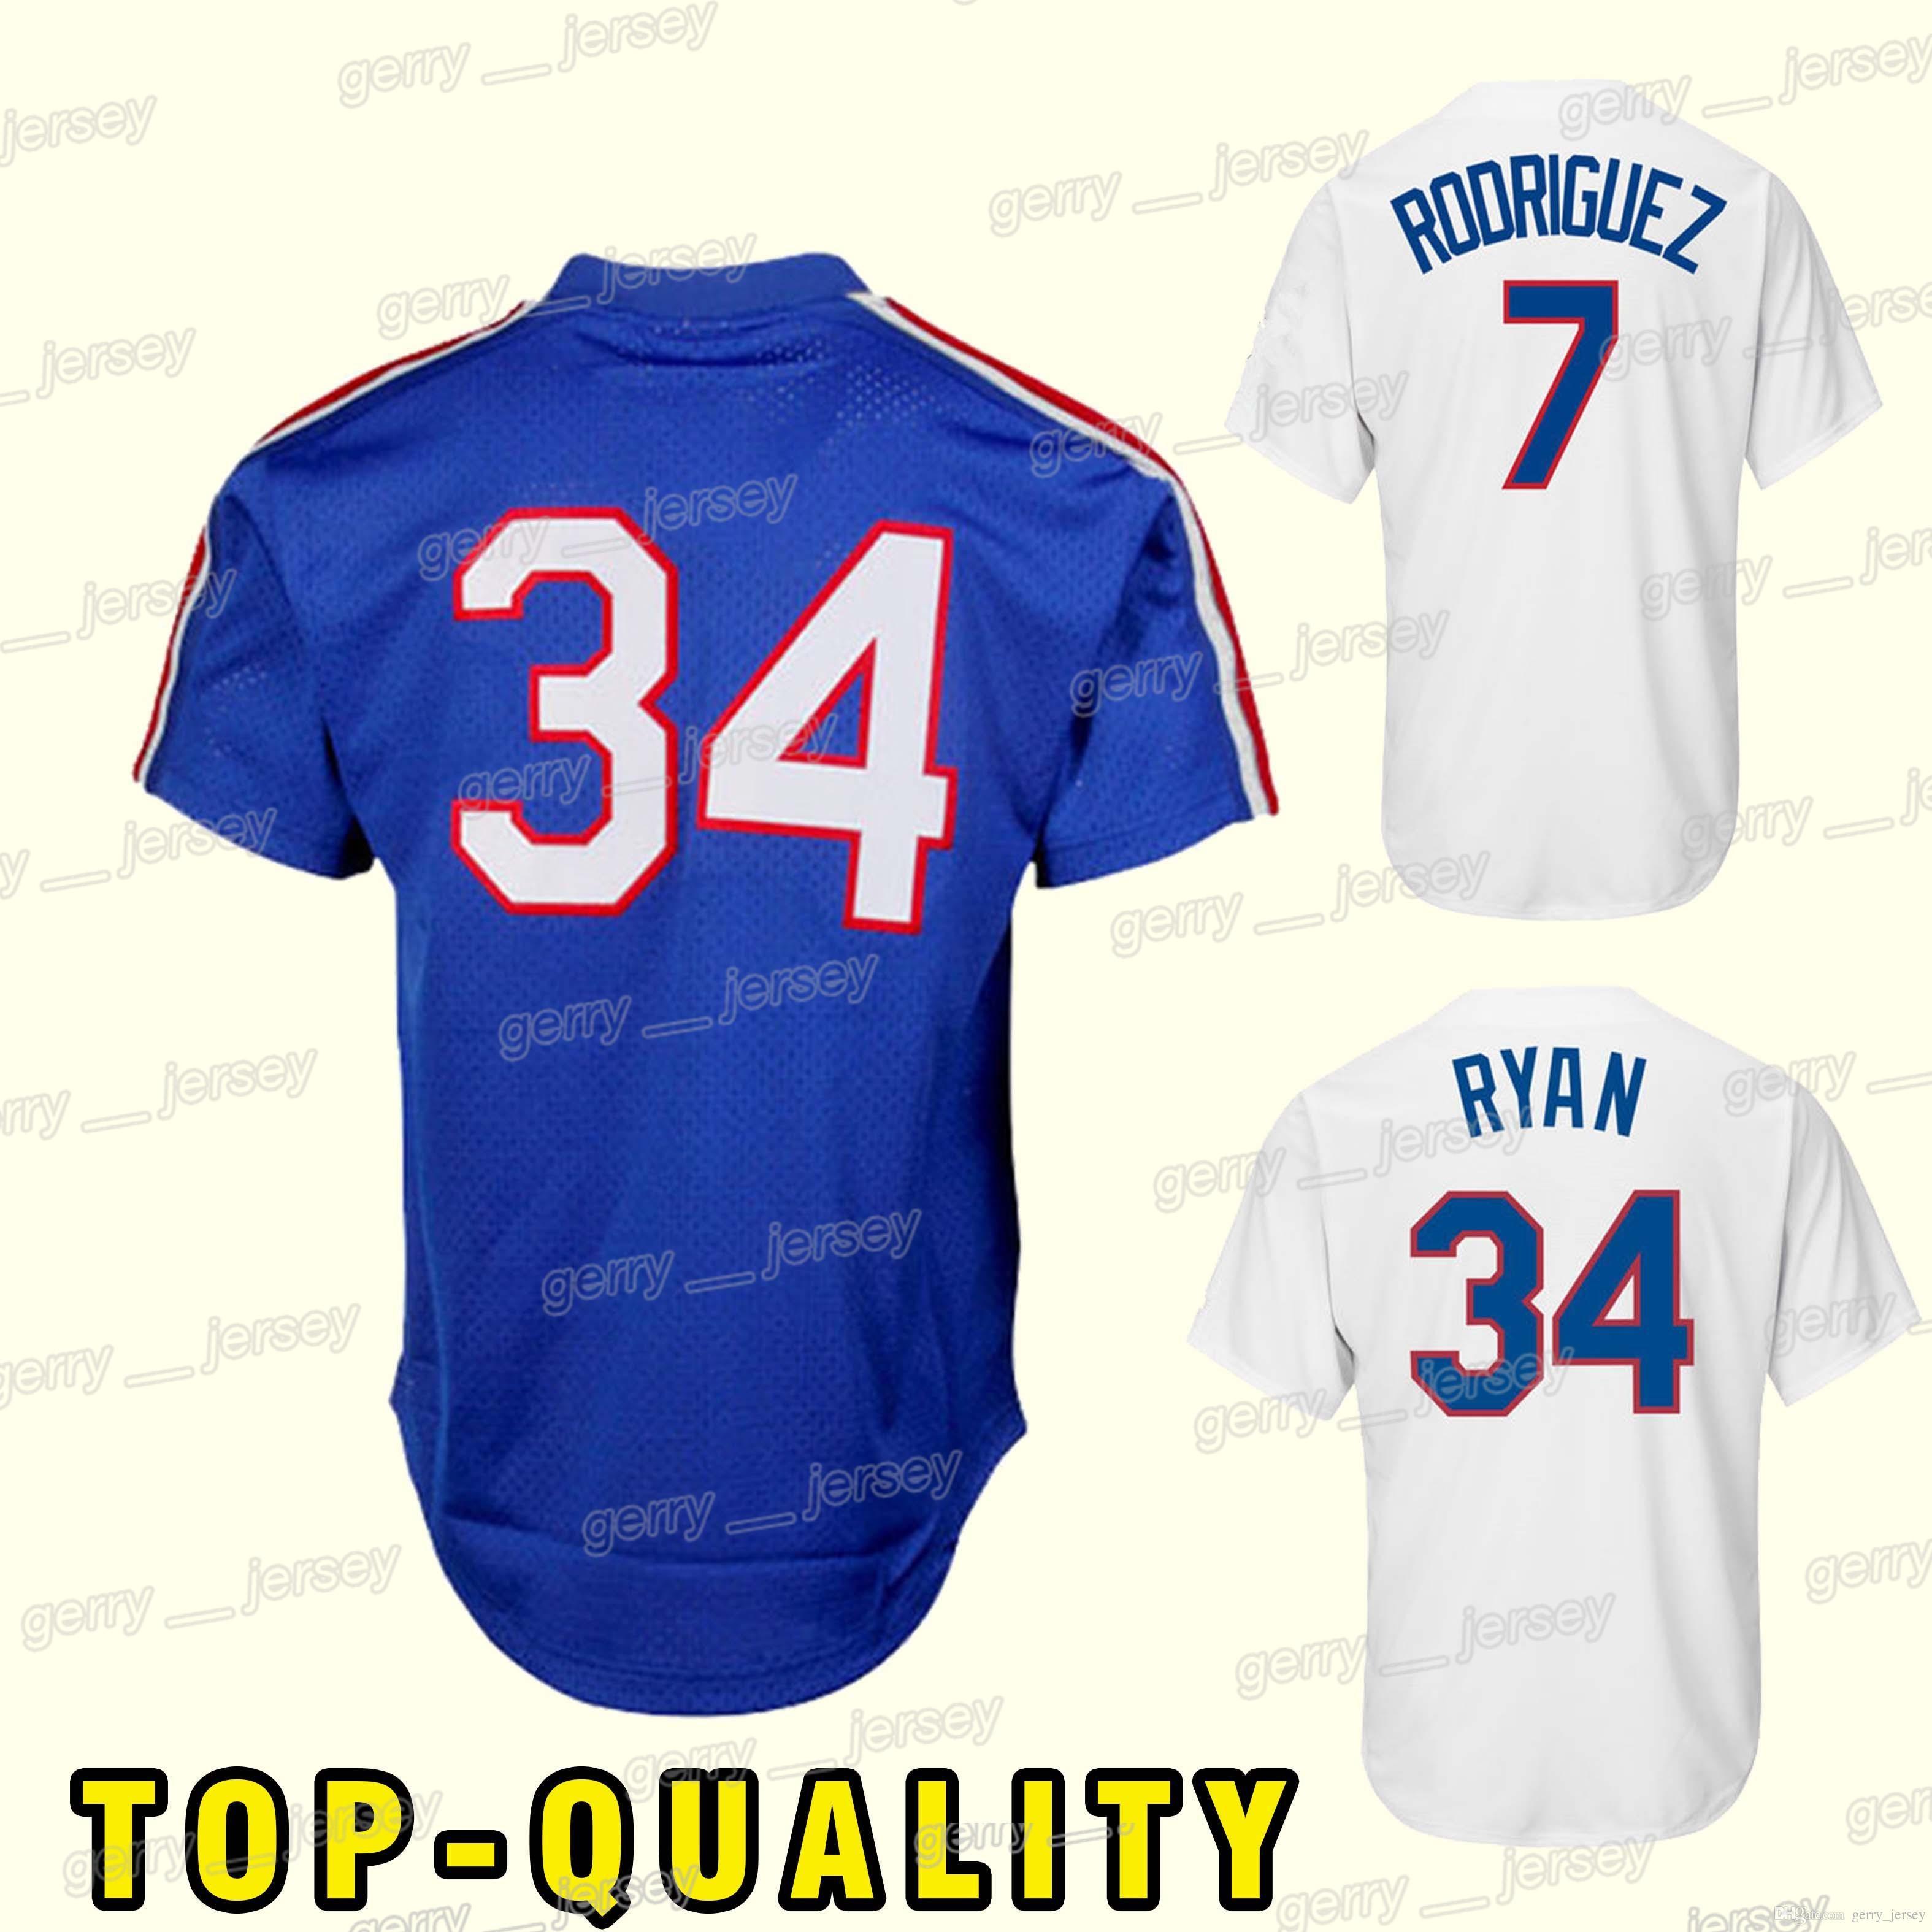 hot sale online 3173d ebfd5 discount texas rangers pudge rodriguez jersey 2cc0d 96b17